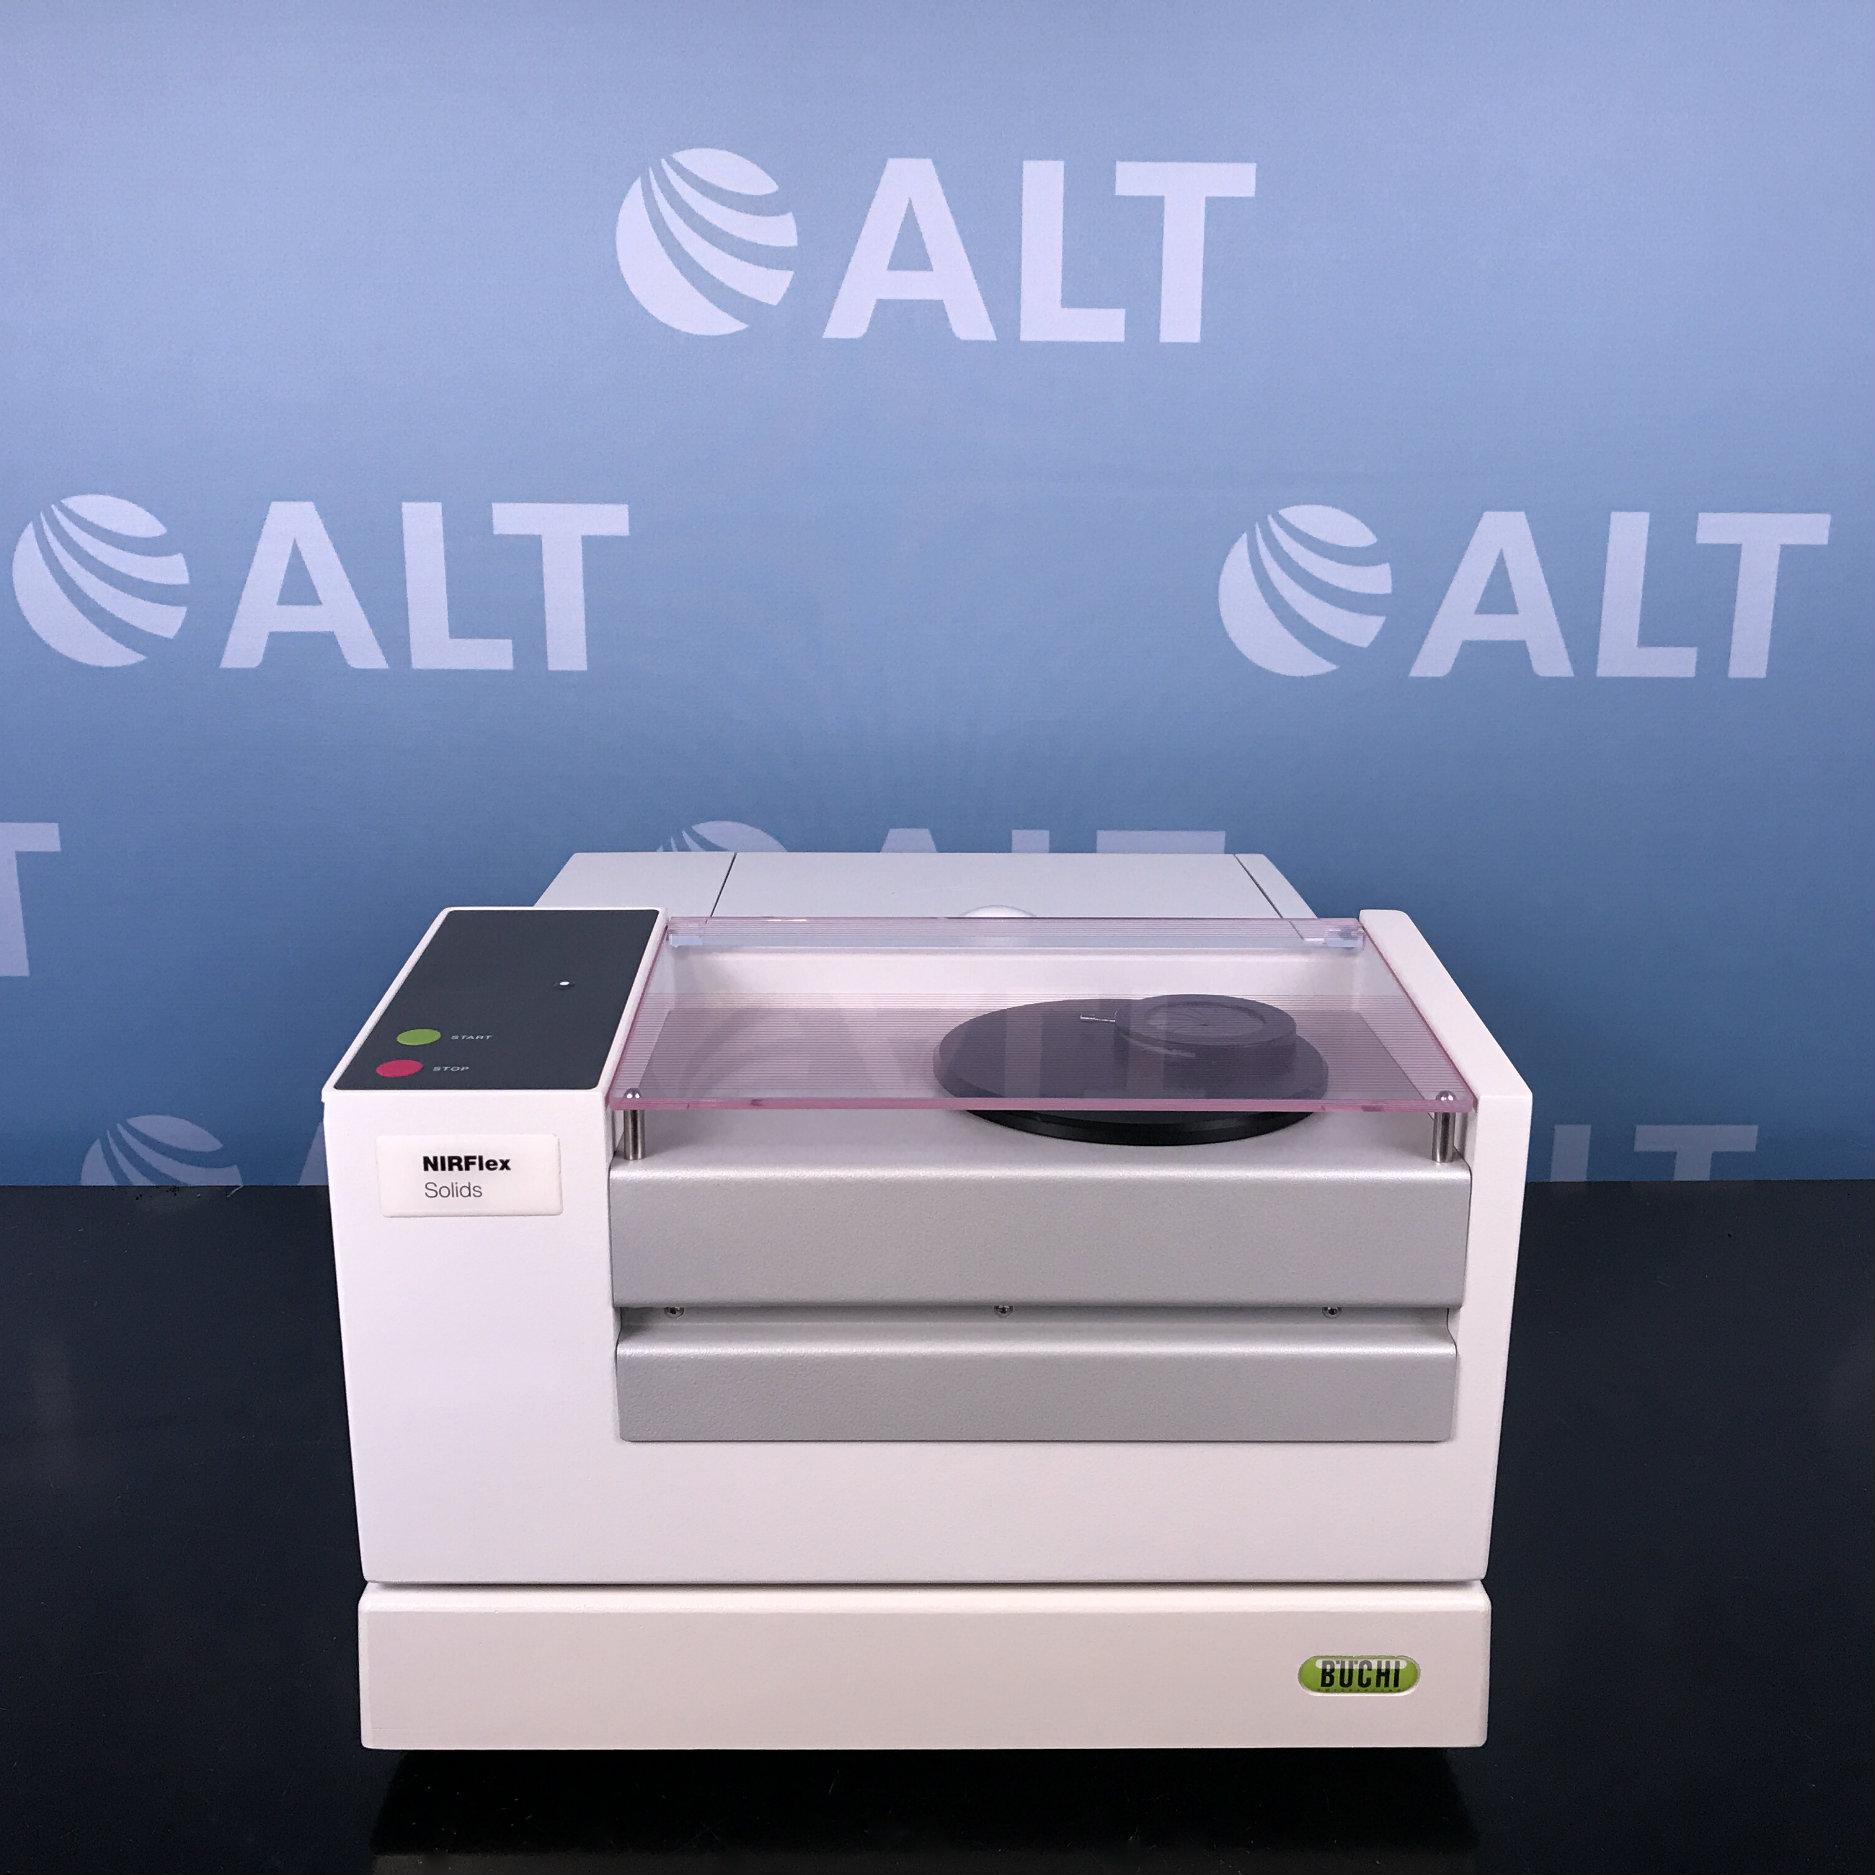 Buchi NIRFlex Solids N-500 Spectrometer  Image